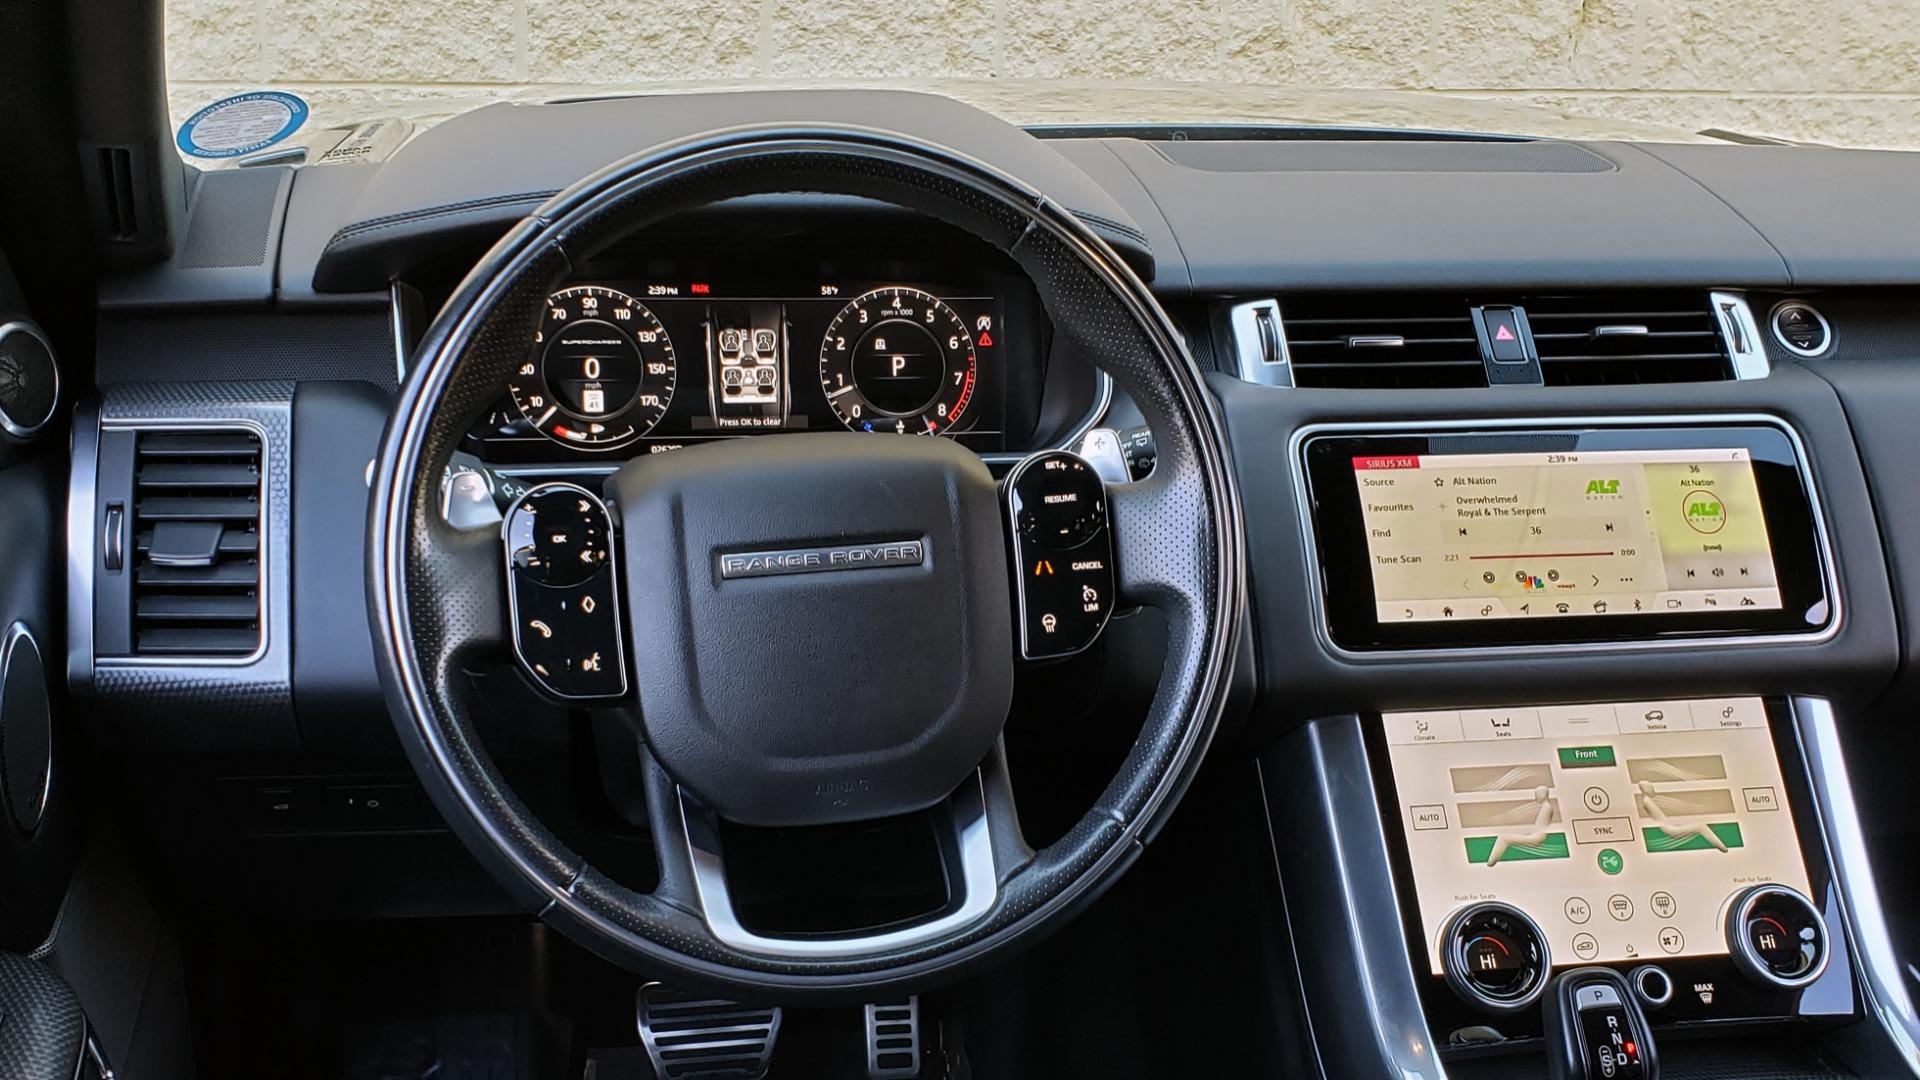 Used 2018 Land Rover RANGE ROVER SPORT DYNAMIC SC V8 / CLIMATE CMFRT / VISION ASST / MERIDIAN for sale Sold at Formula Imports in Charlotte NC 28227 48